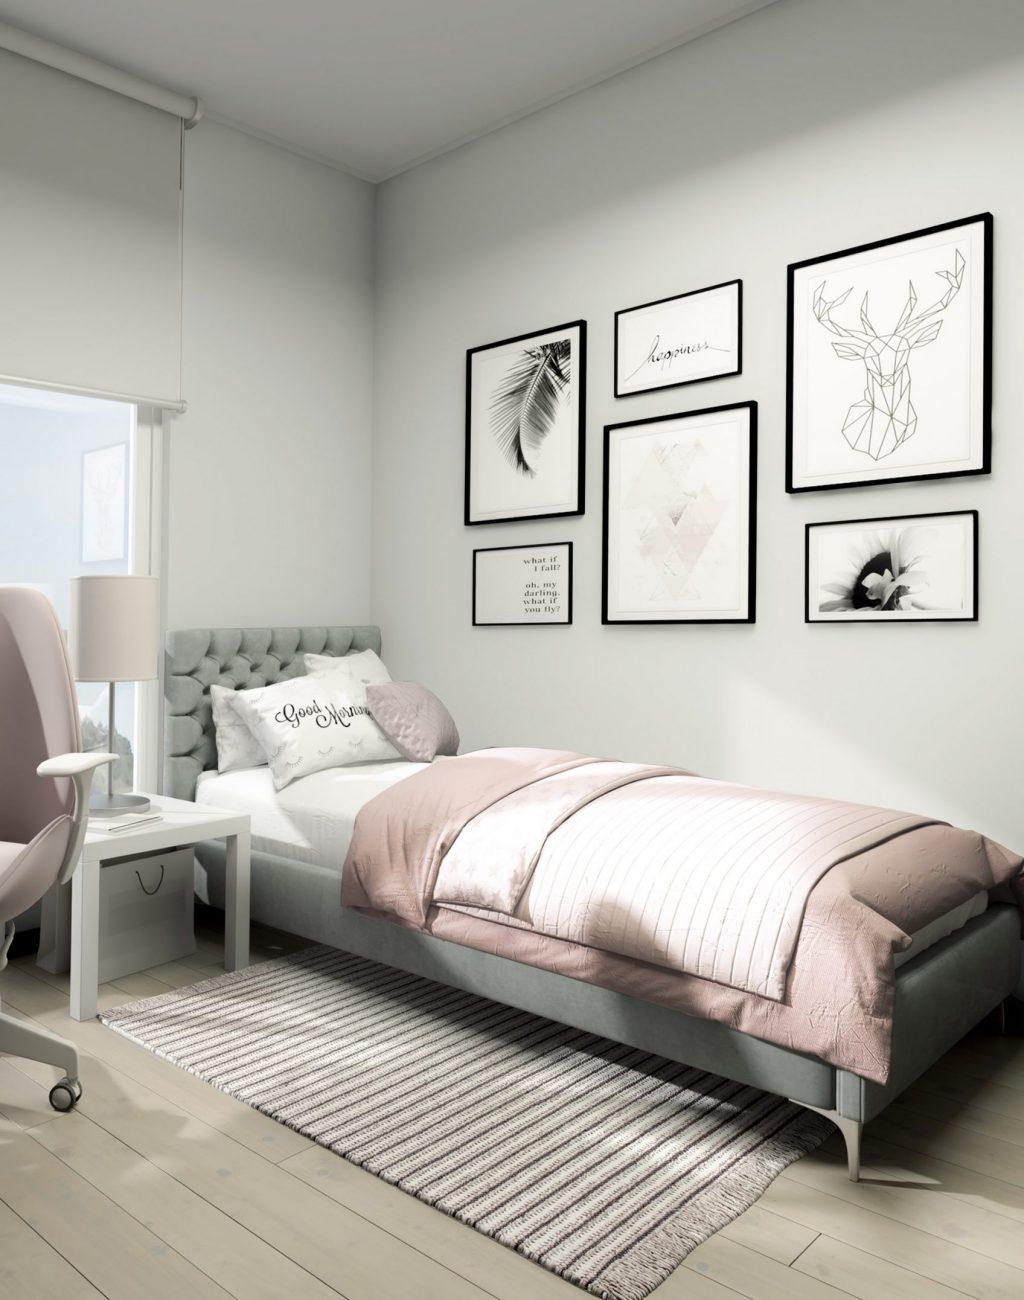 Dormitorio 2_pataguas 10-02-21-min